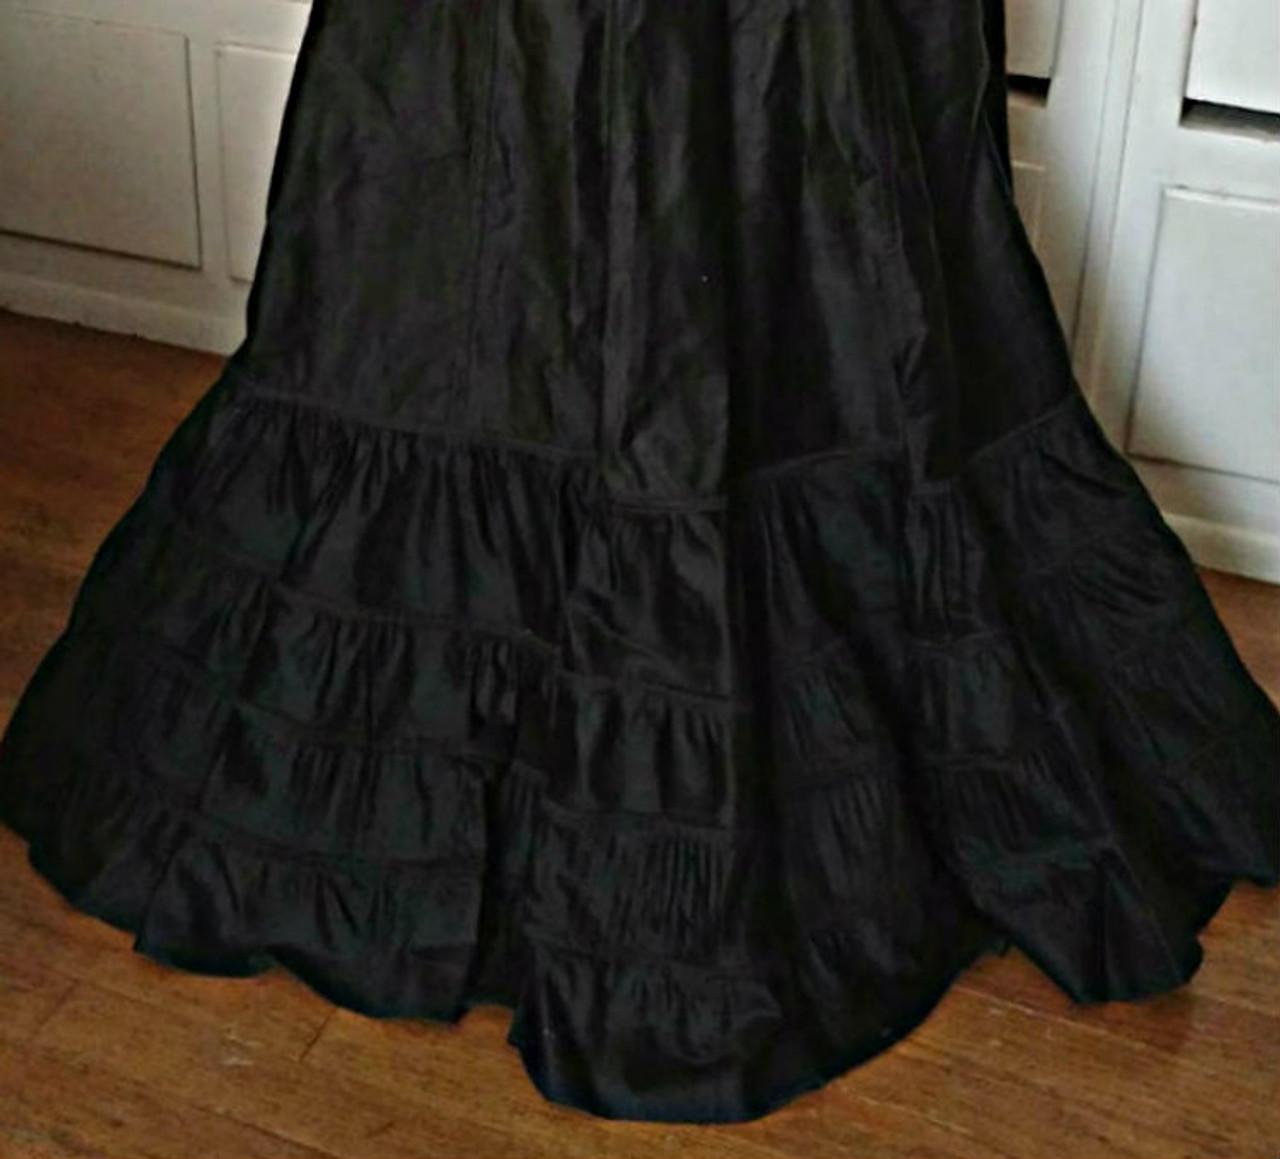 Black Sateen Victorian Petticoat Double Ruffle Vintage Gothic Steampunk